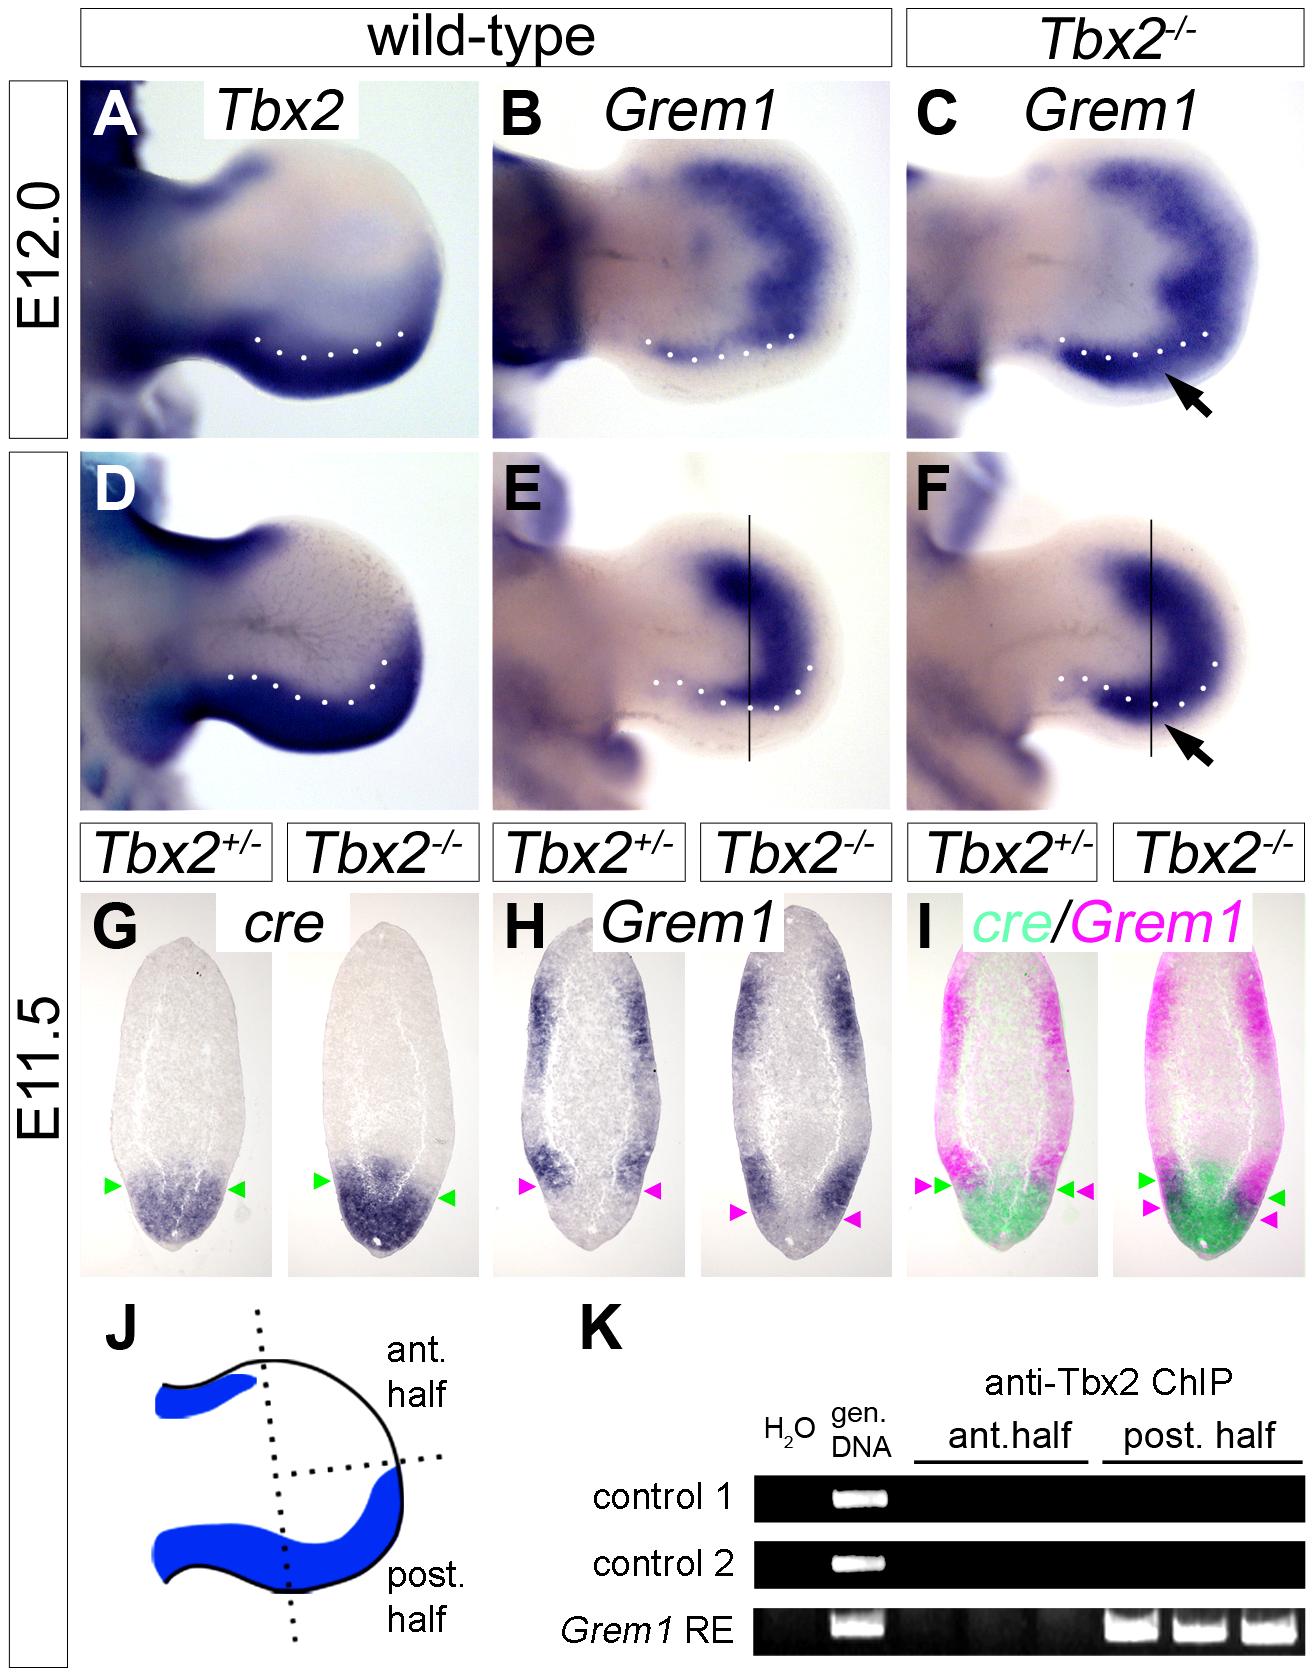 <i>Tbx2</i> directly represses <i>Grem1</i> expression in the posterior hindlimb mesenchyme.